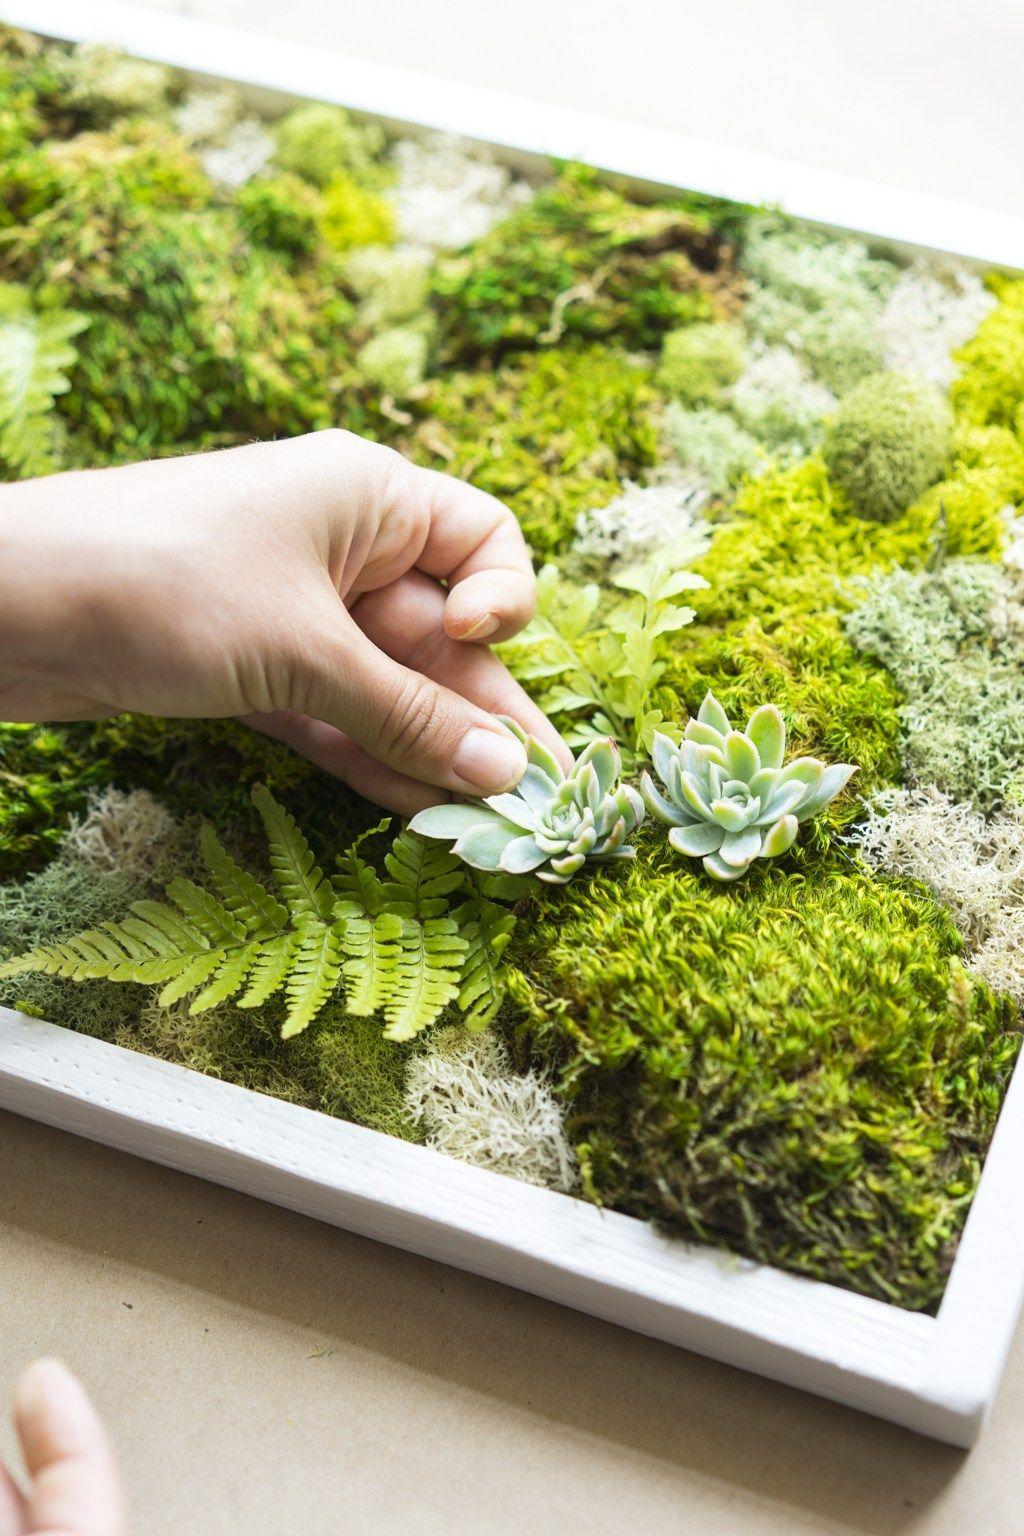 How to Make a Carefree Moss Garden - Dalla Vita